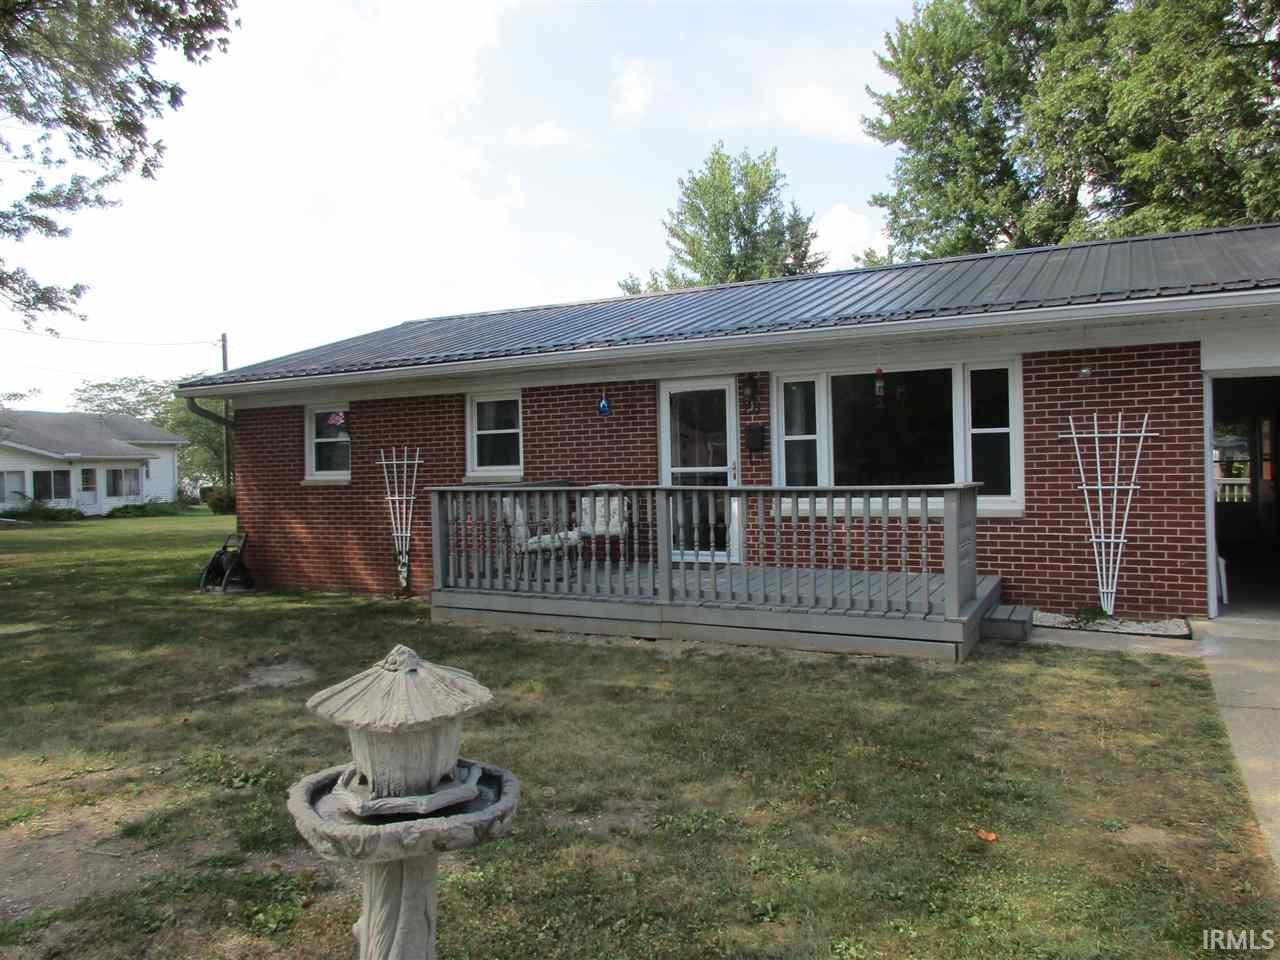 Astonishing 28 W Washington Street Williamsport 47993 Sold Listing Carpenter Realtors Inc Home Interior And Landscaping Synyenasavecom